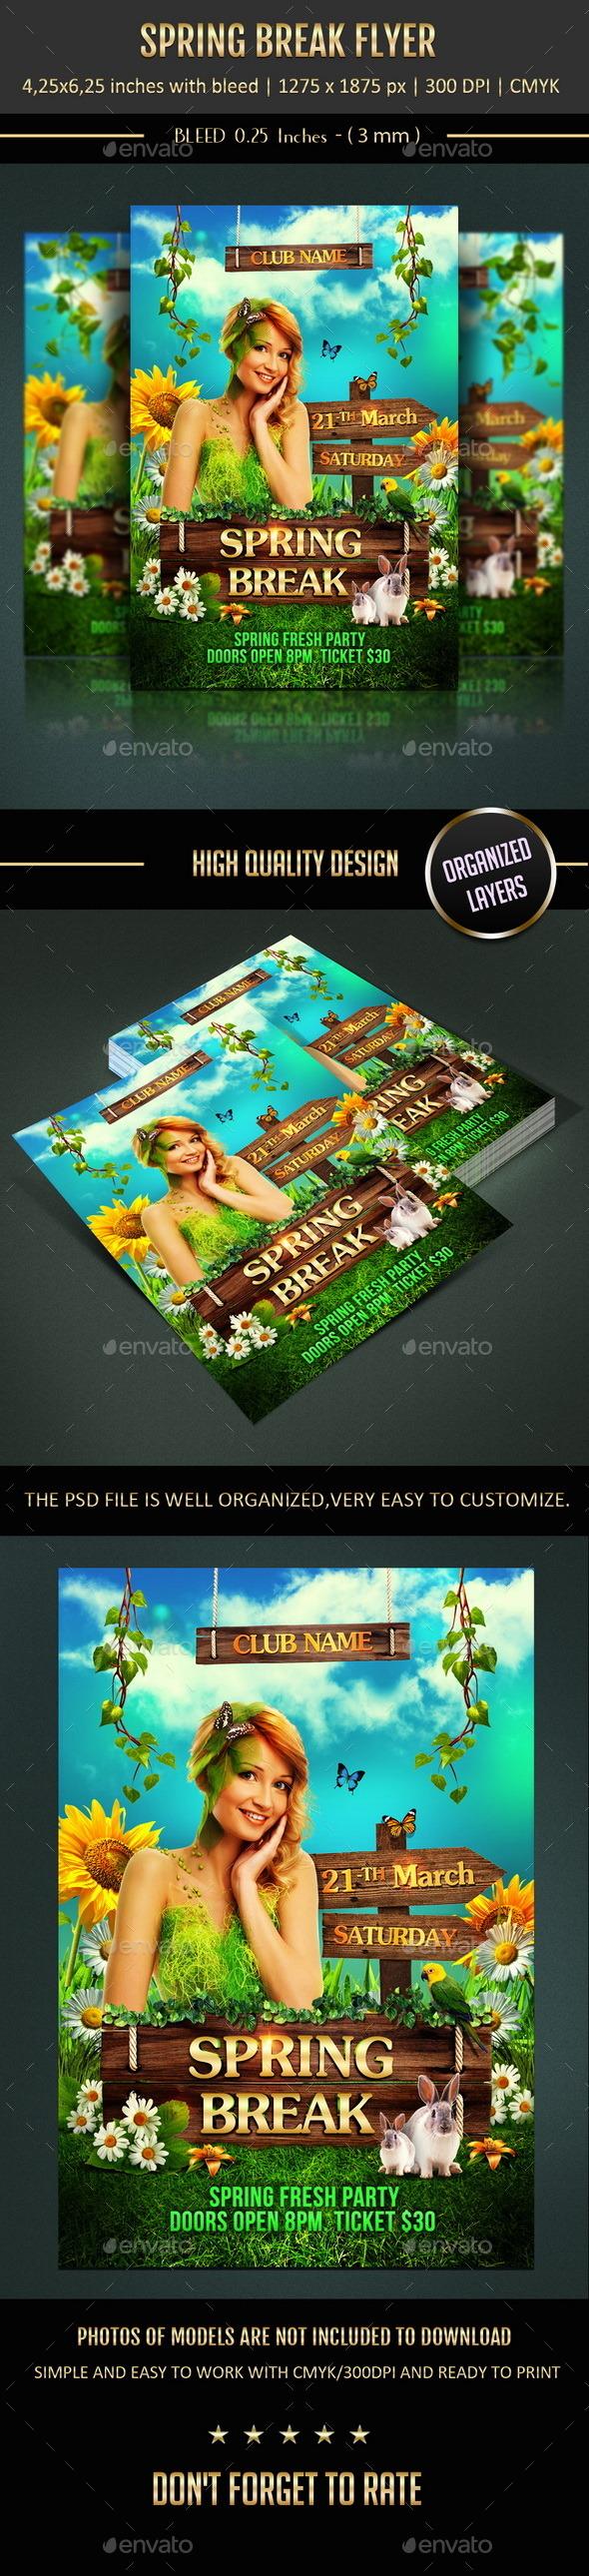 GraphicRiver Spring Break Flyer 10547951